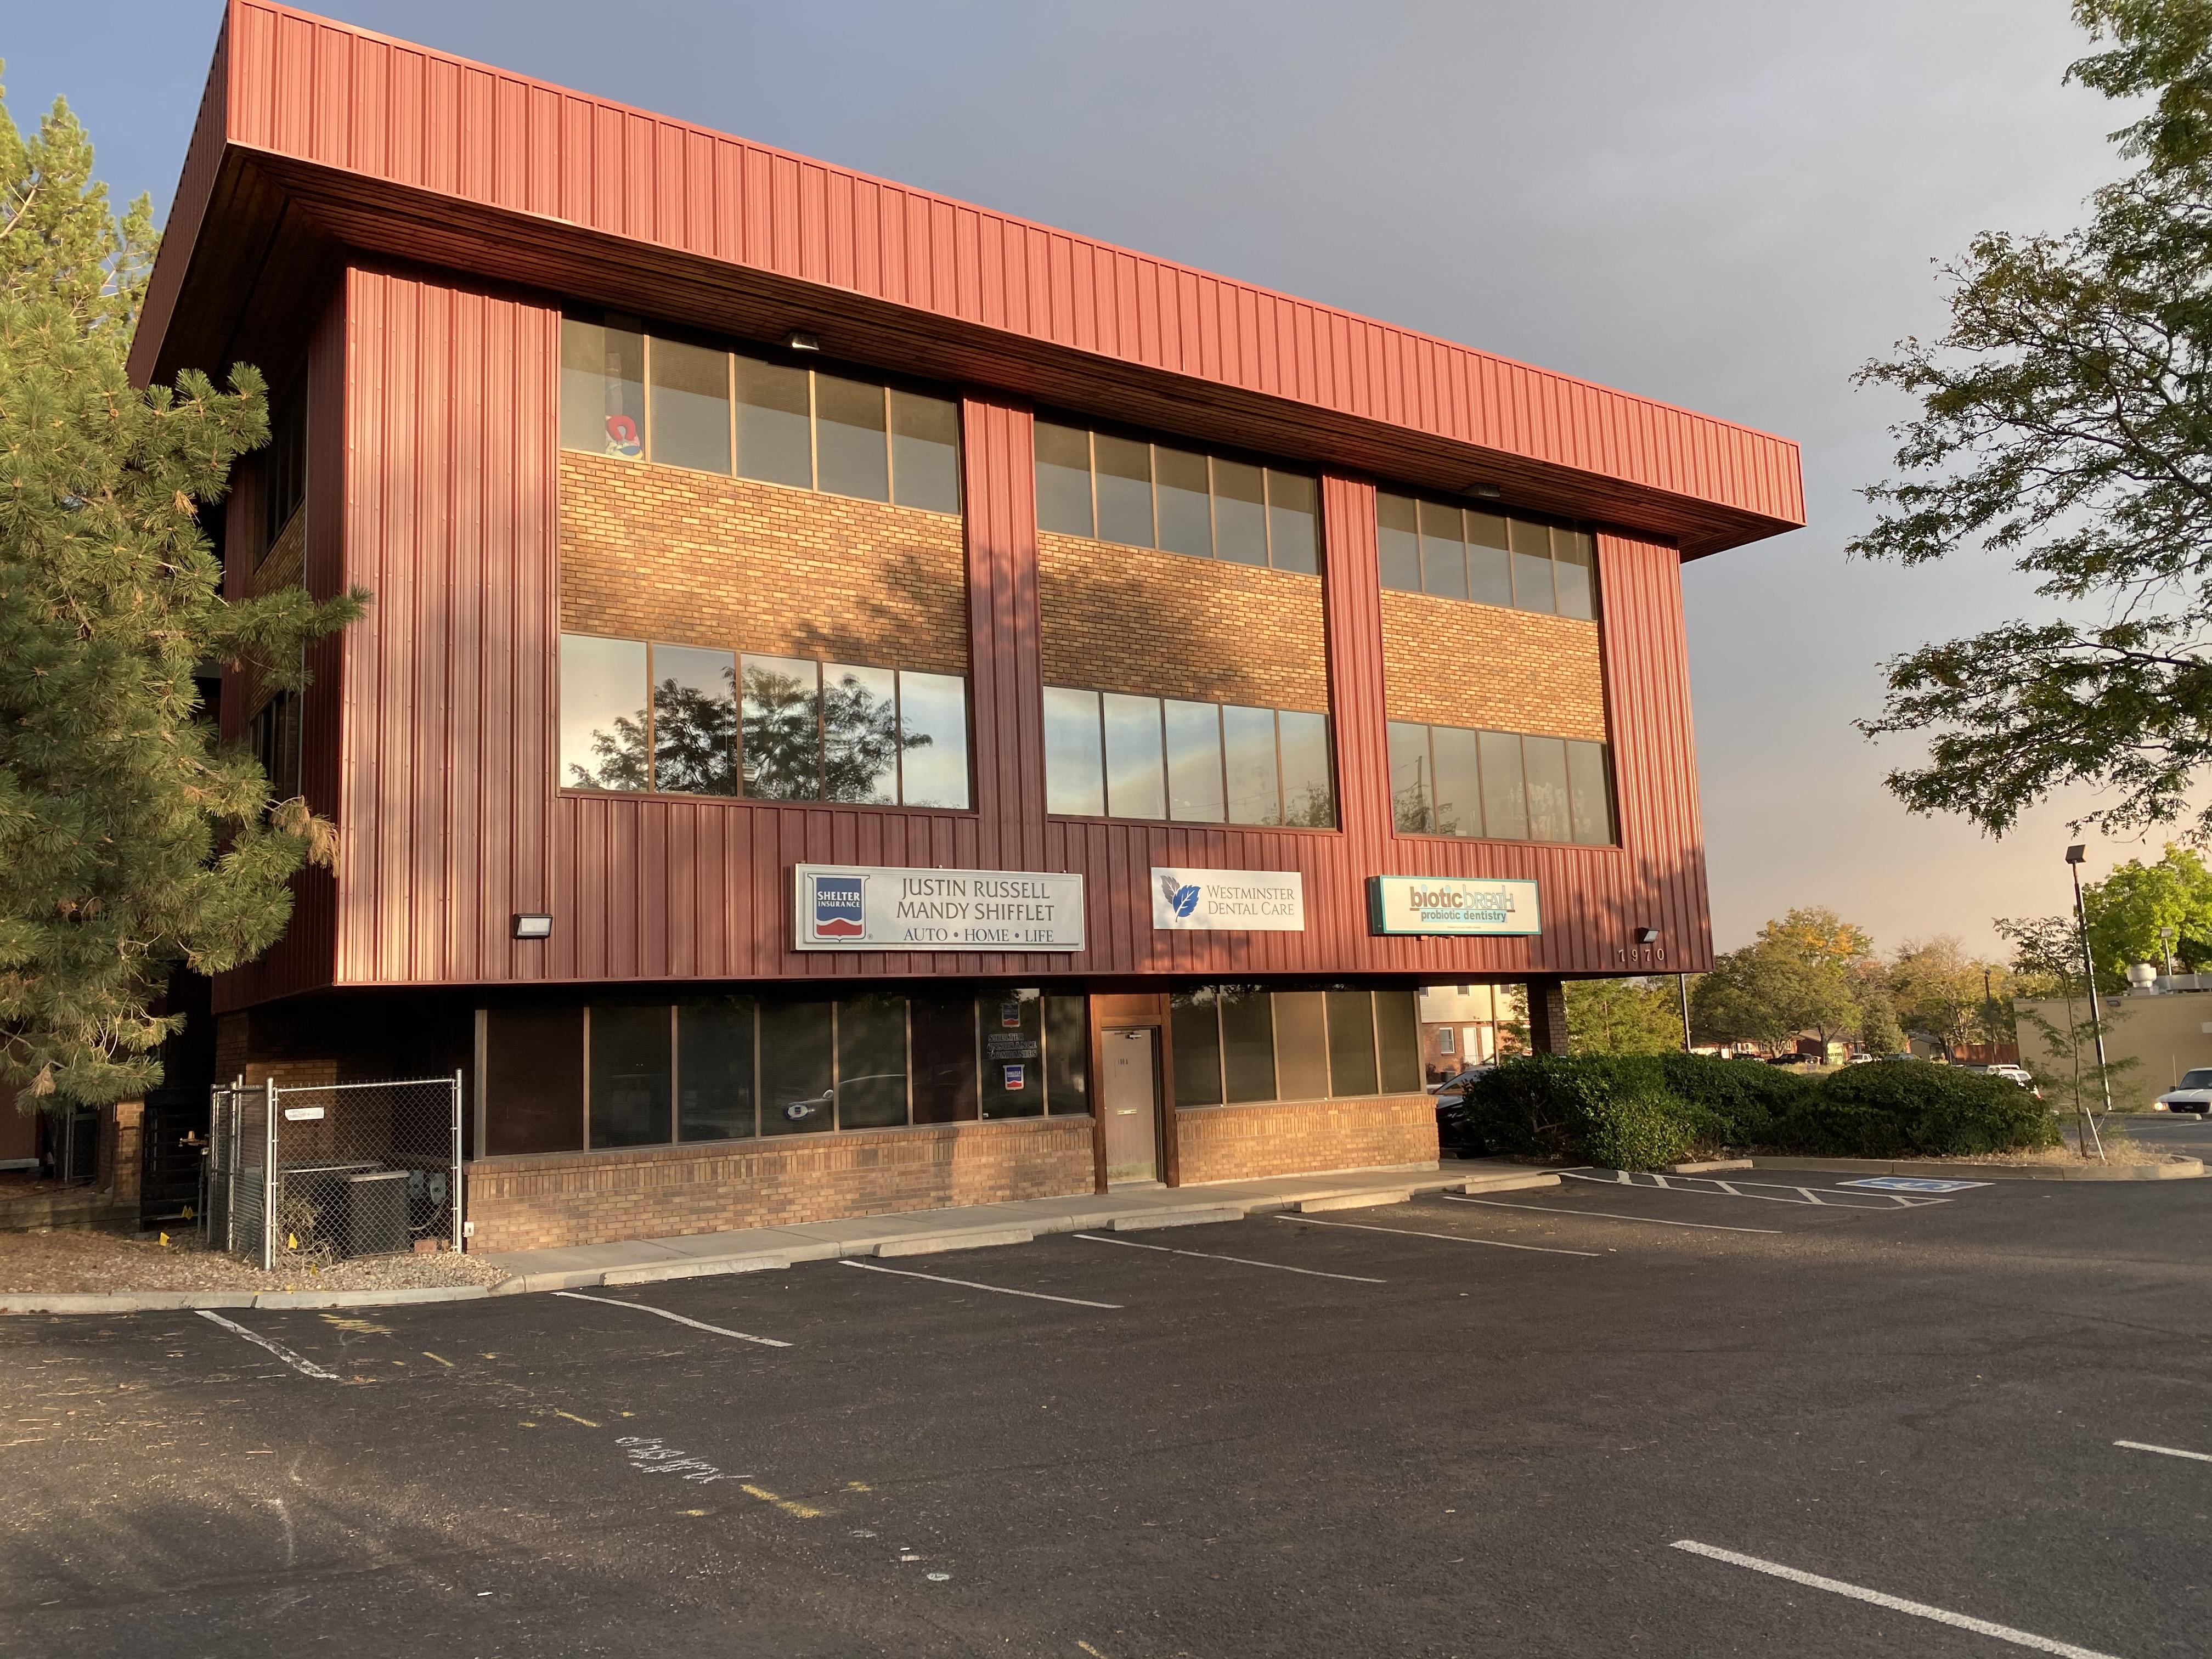 Exterior view of the building Westminster Dental Care